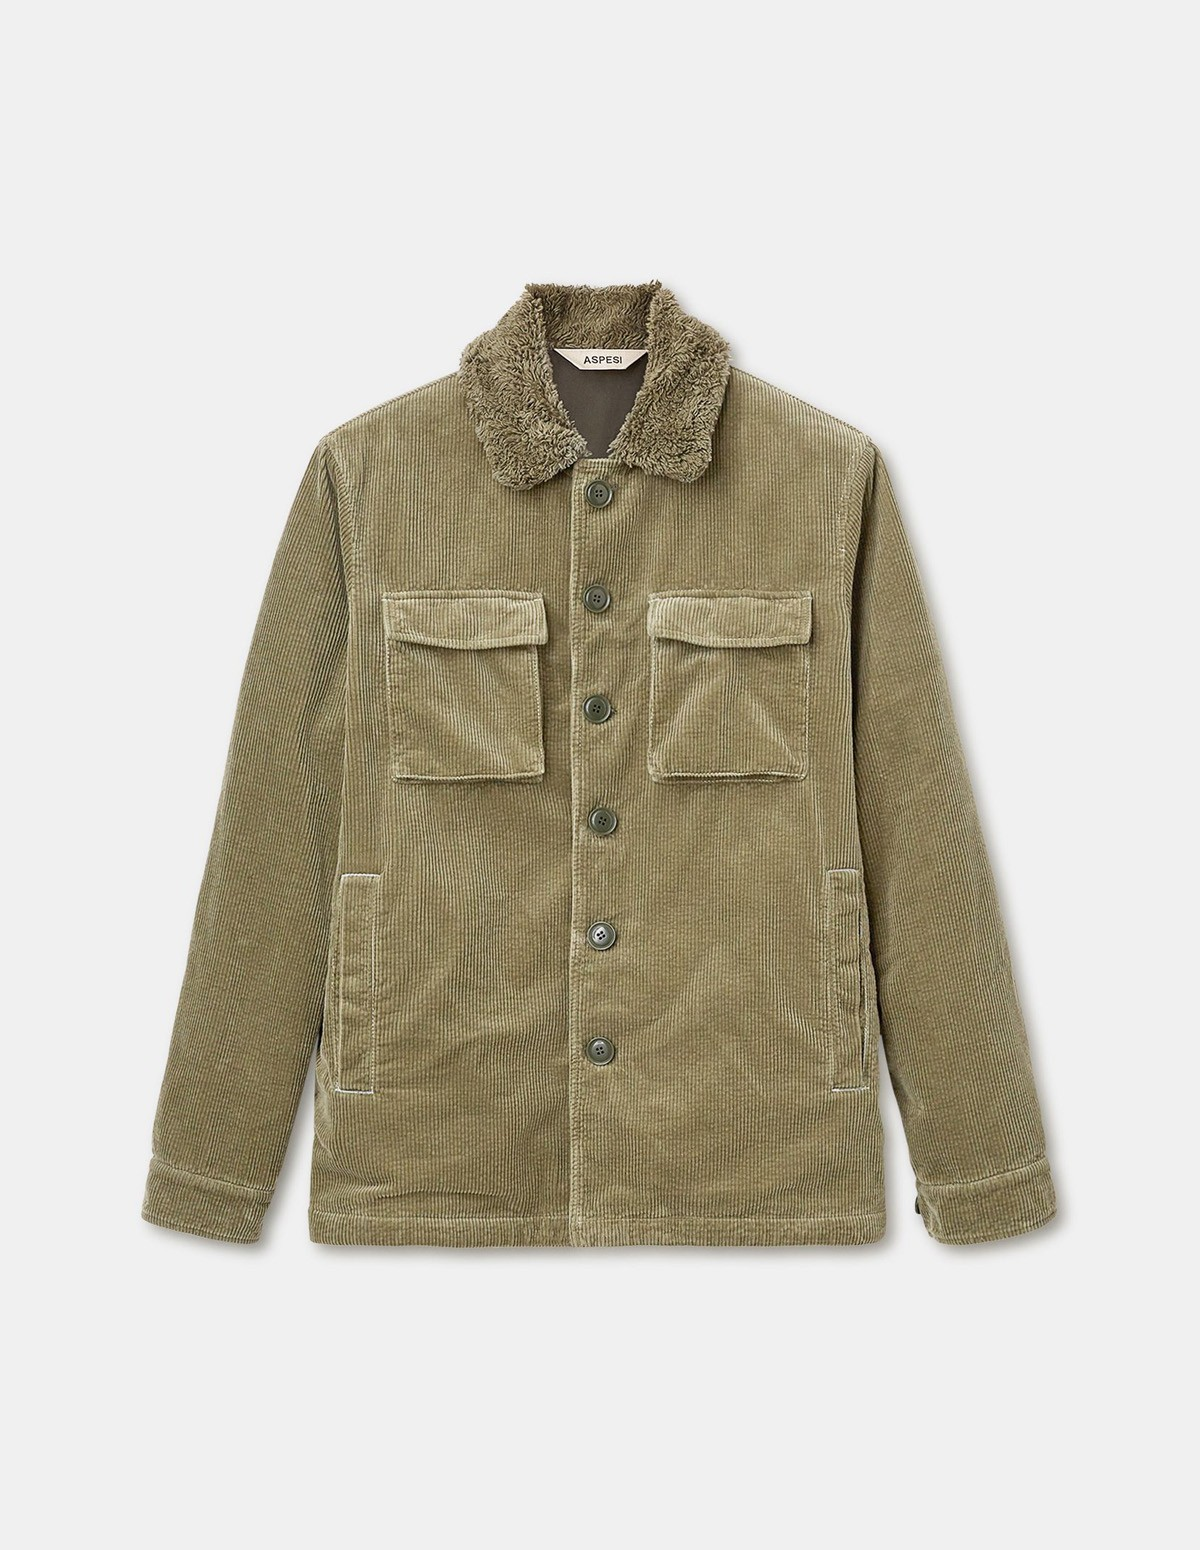 Aspesi Tigre Ii Jacket - GREEN